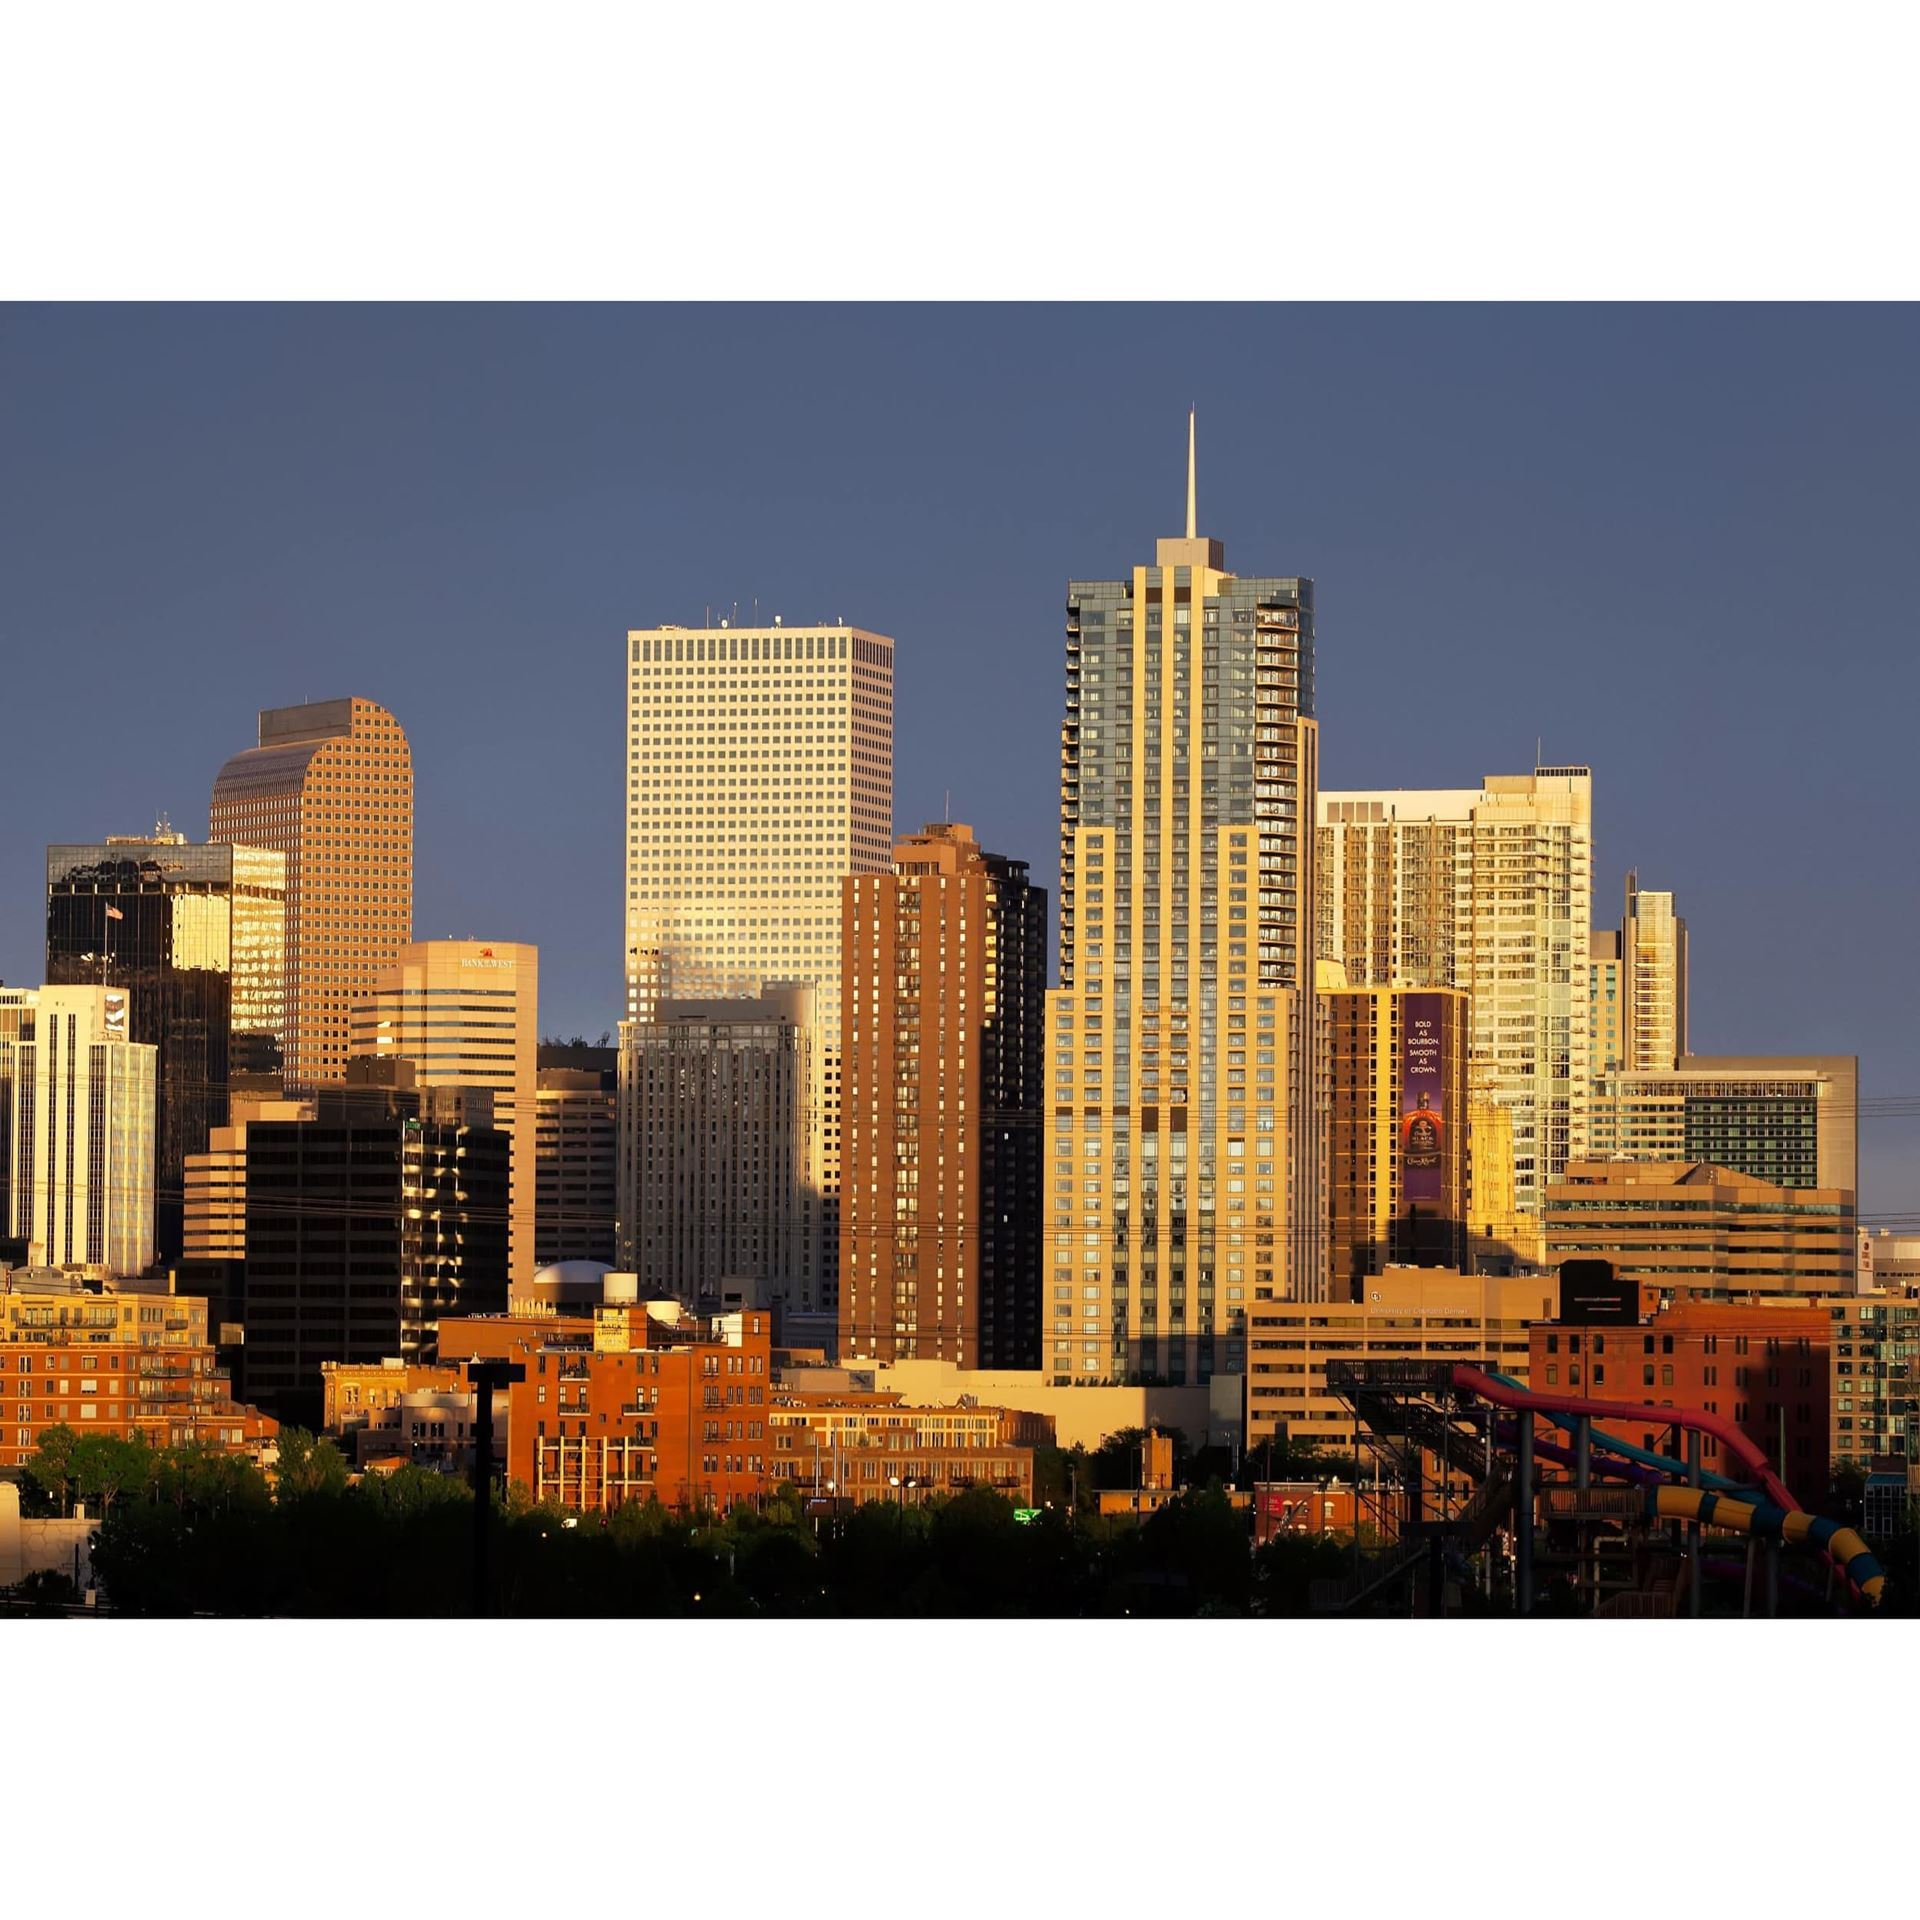 Downtown Denver 48x32